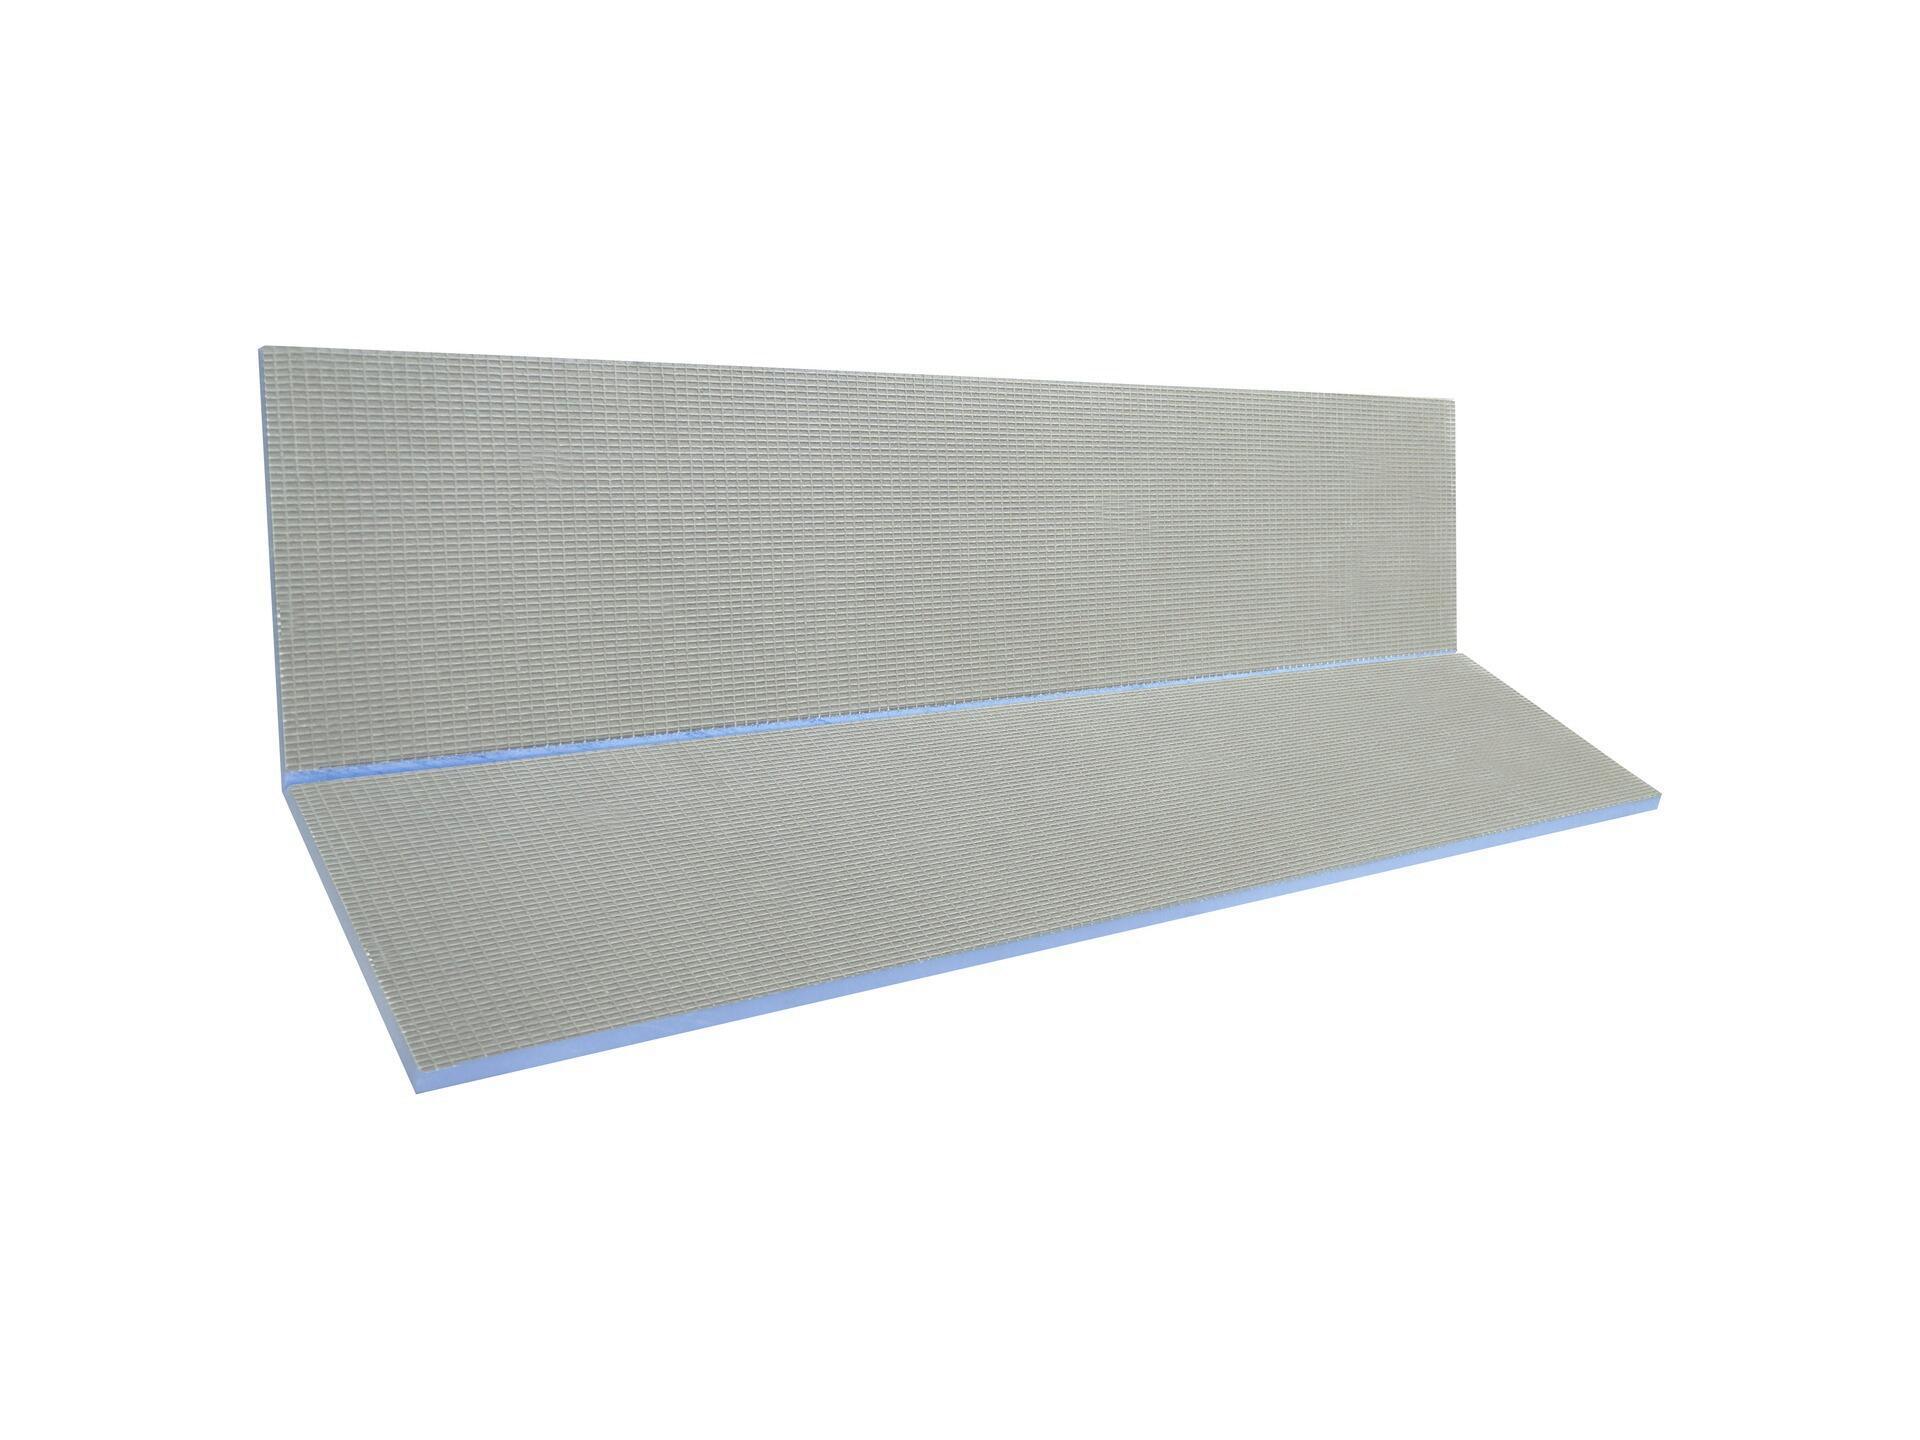 Marmox Cache Tuyau Element D Angle 150 150 Mm Hubo